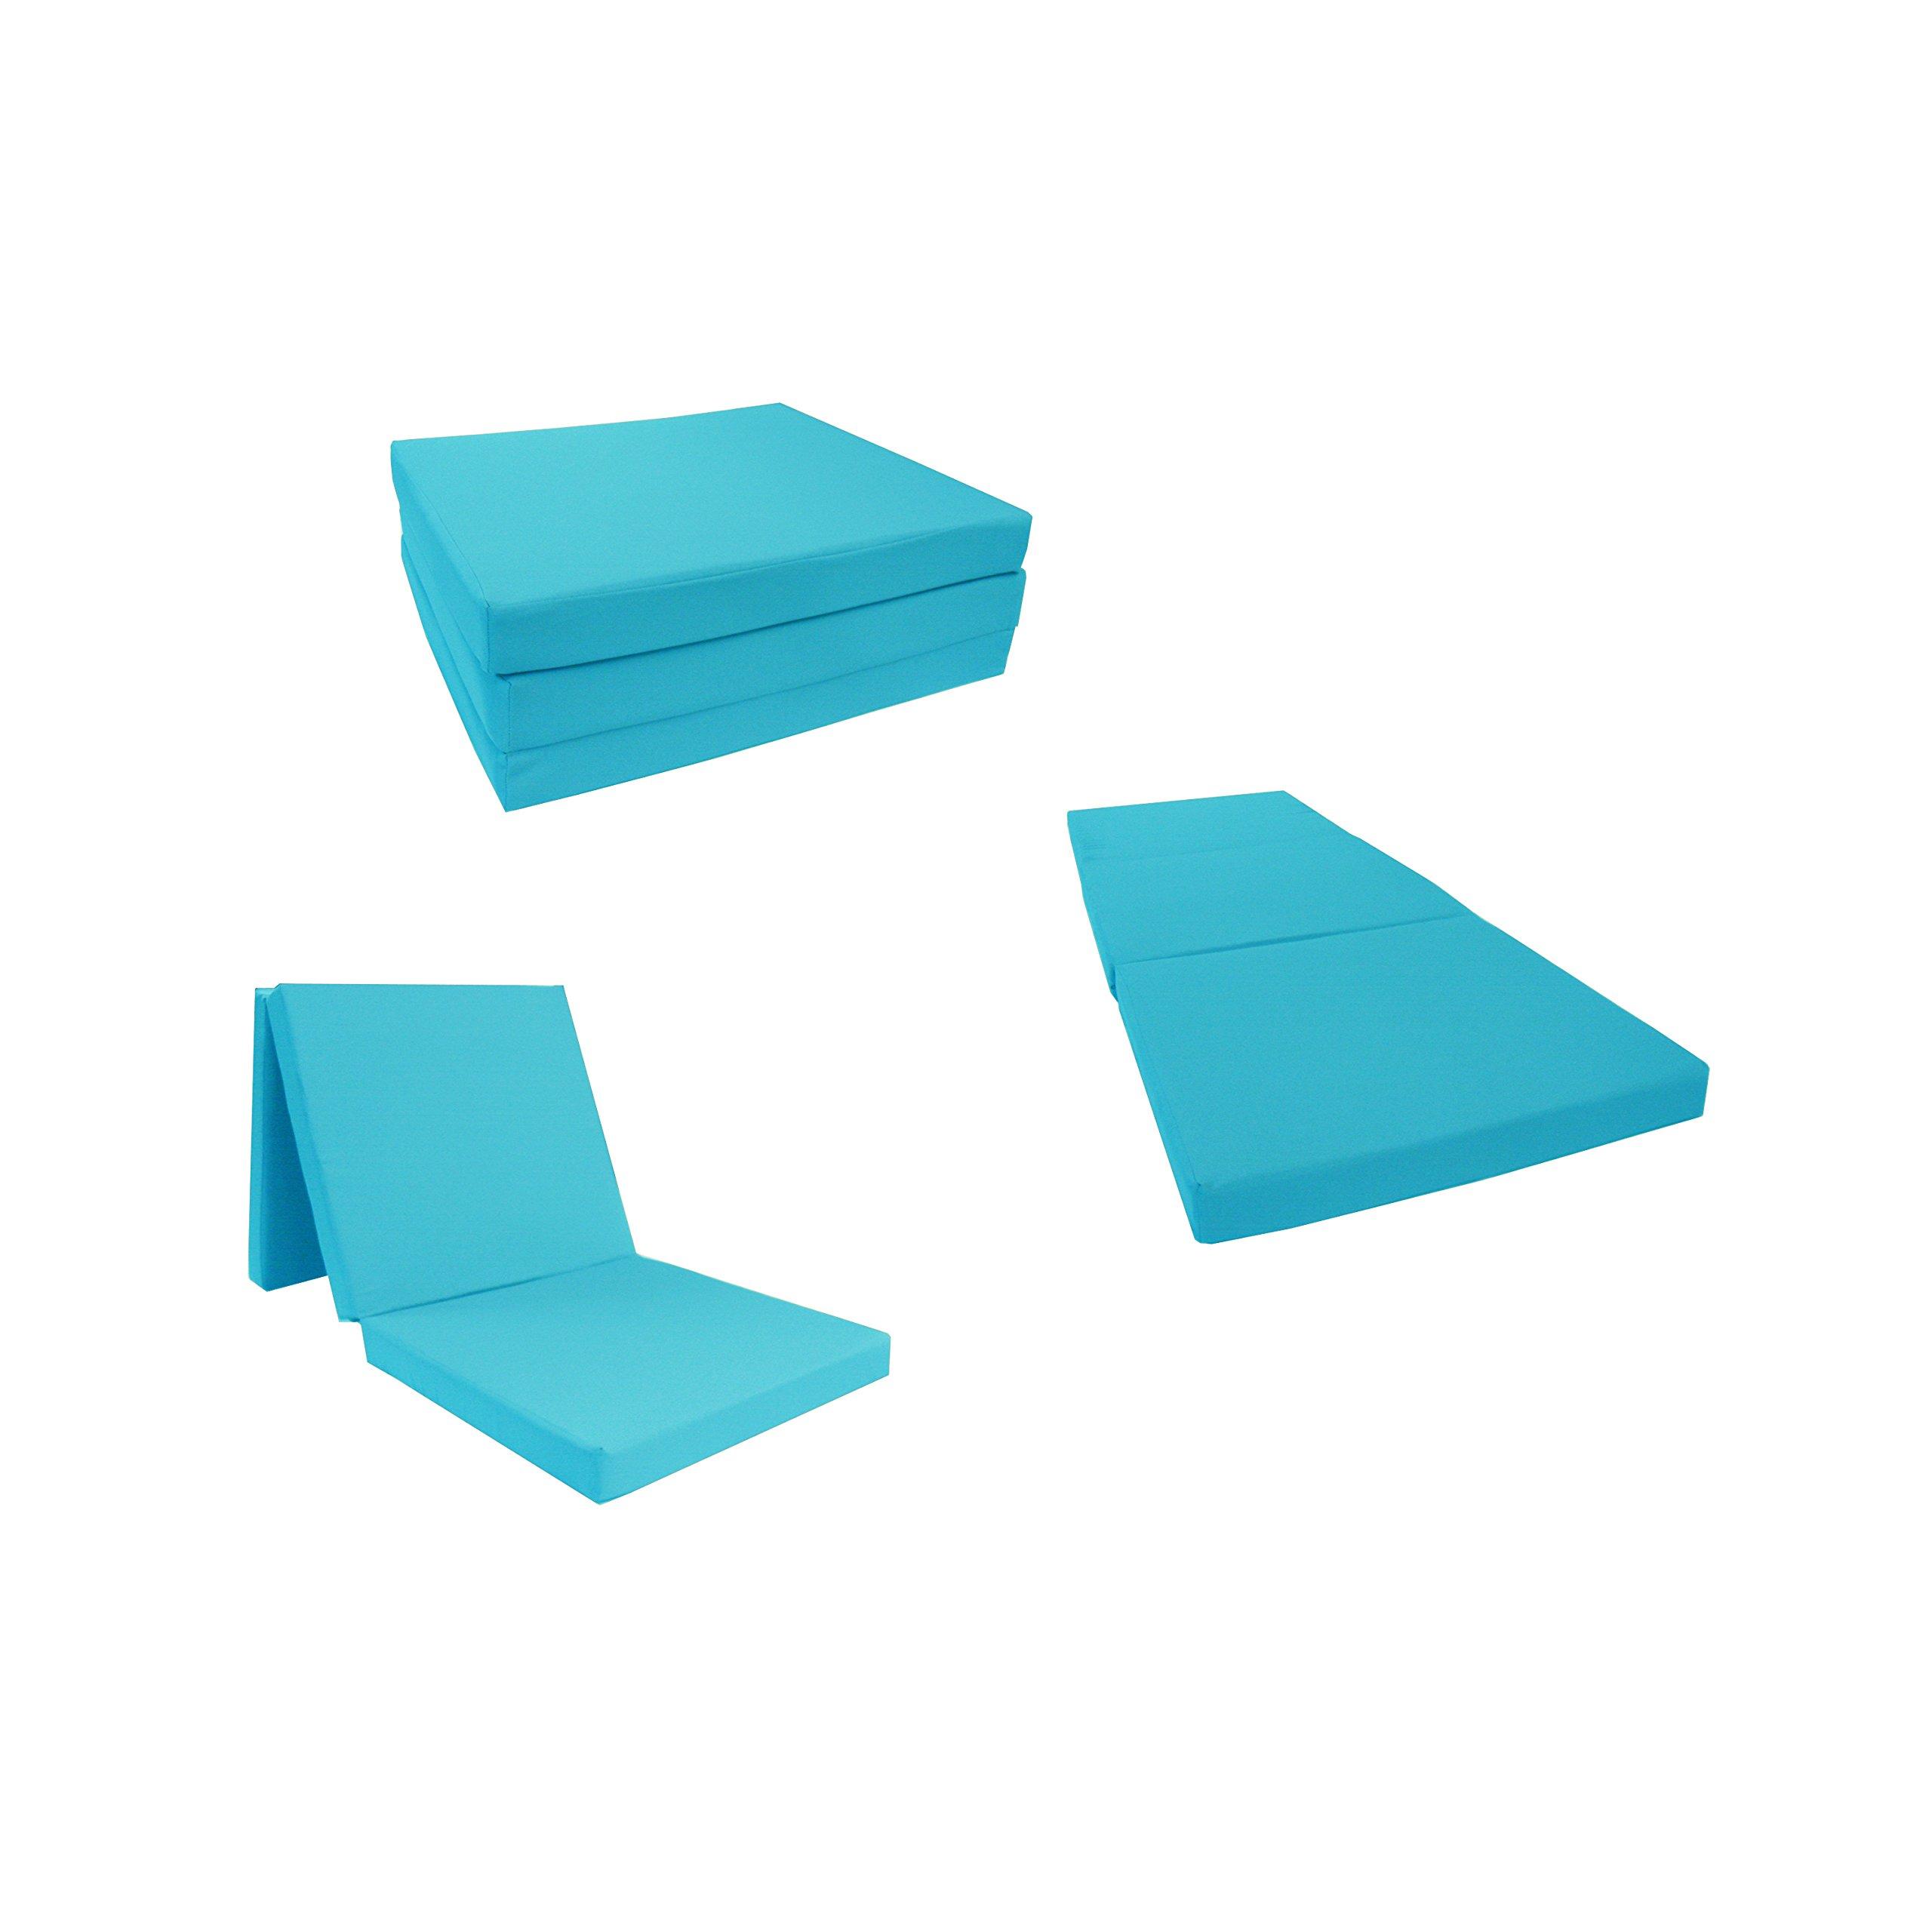 D&D Futon Furniture Turquoise Shikibuton Tri fold Foam Beds 3'' Thick X 27'' Wide X 75'' Long, 1.8 lbs high Density Resilient White Foam, Floor Foam Folding Mats. by D&D Futon Furniture